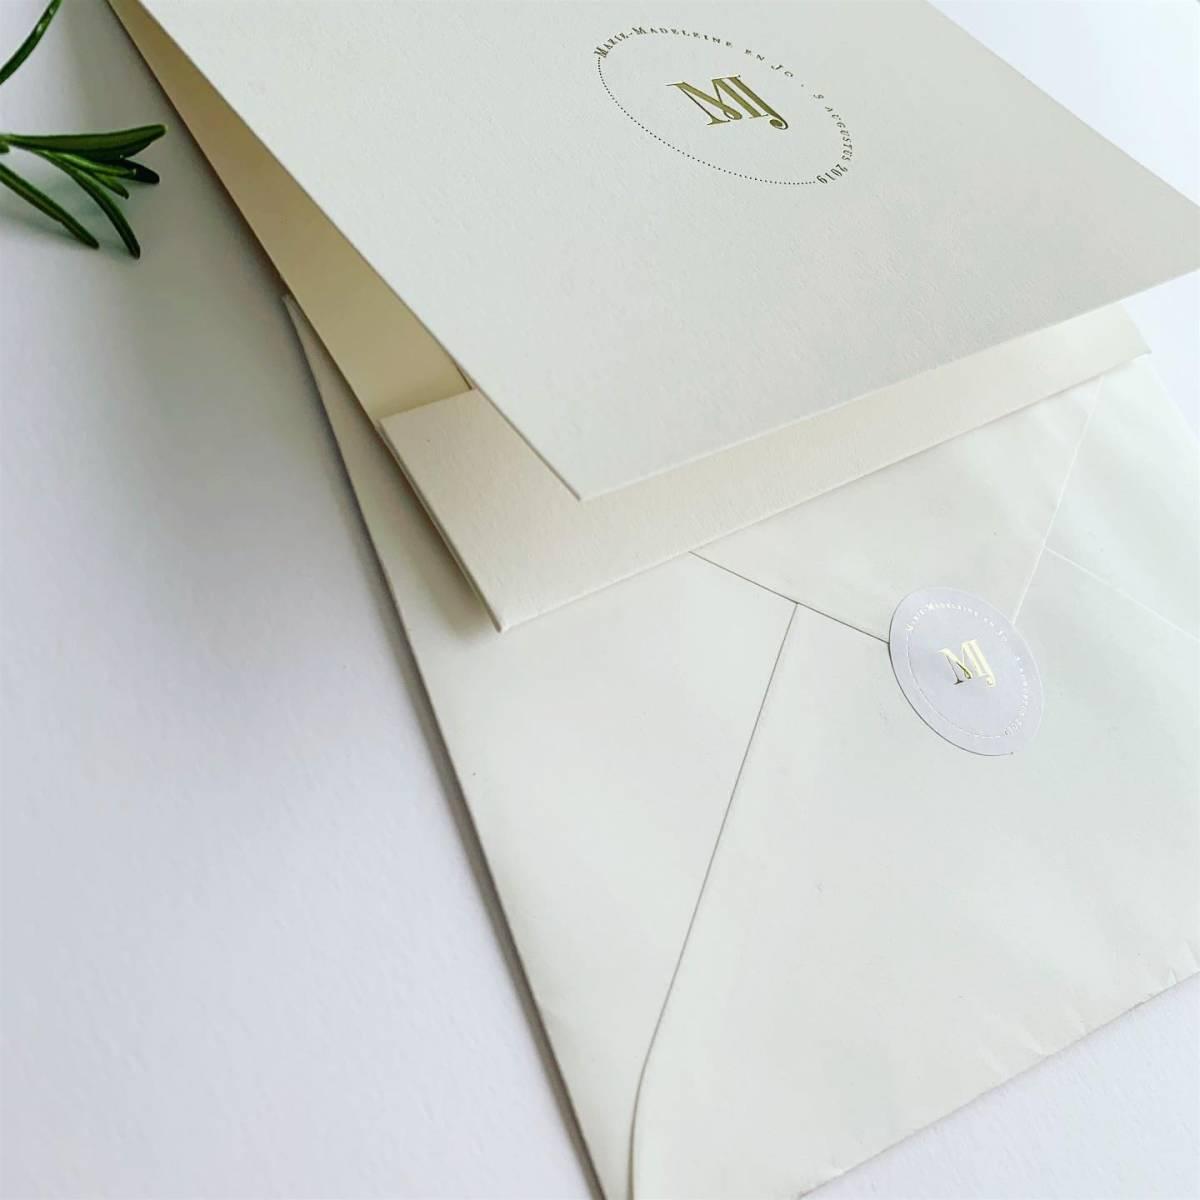 Scarabar - Trouwuitnodiging - Huwelijksuitnodiging - Drukwerk - Huwelijk - Trouw - Bruiloft - House of Weddings - 34